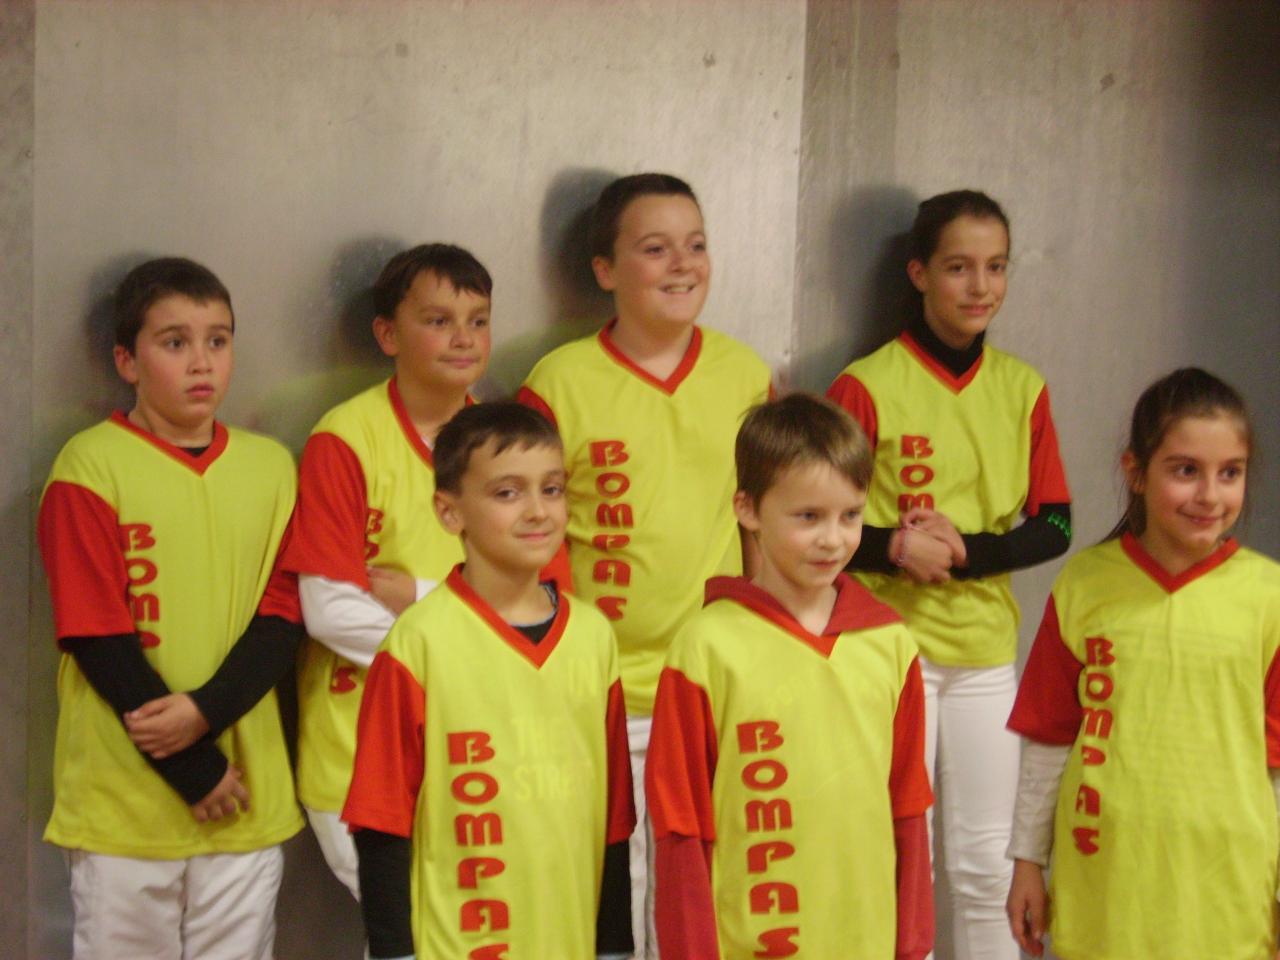 Perpignan (30/11/13)